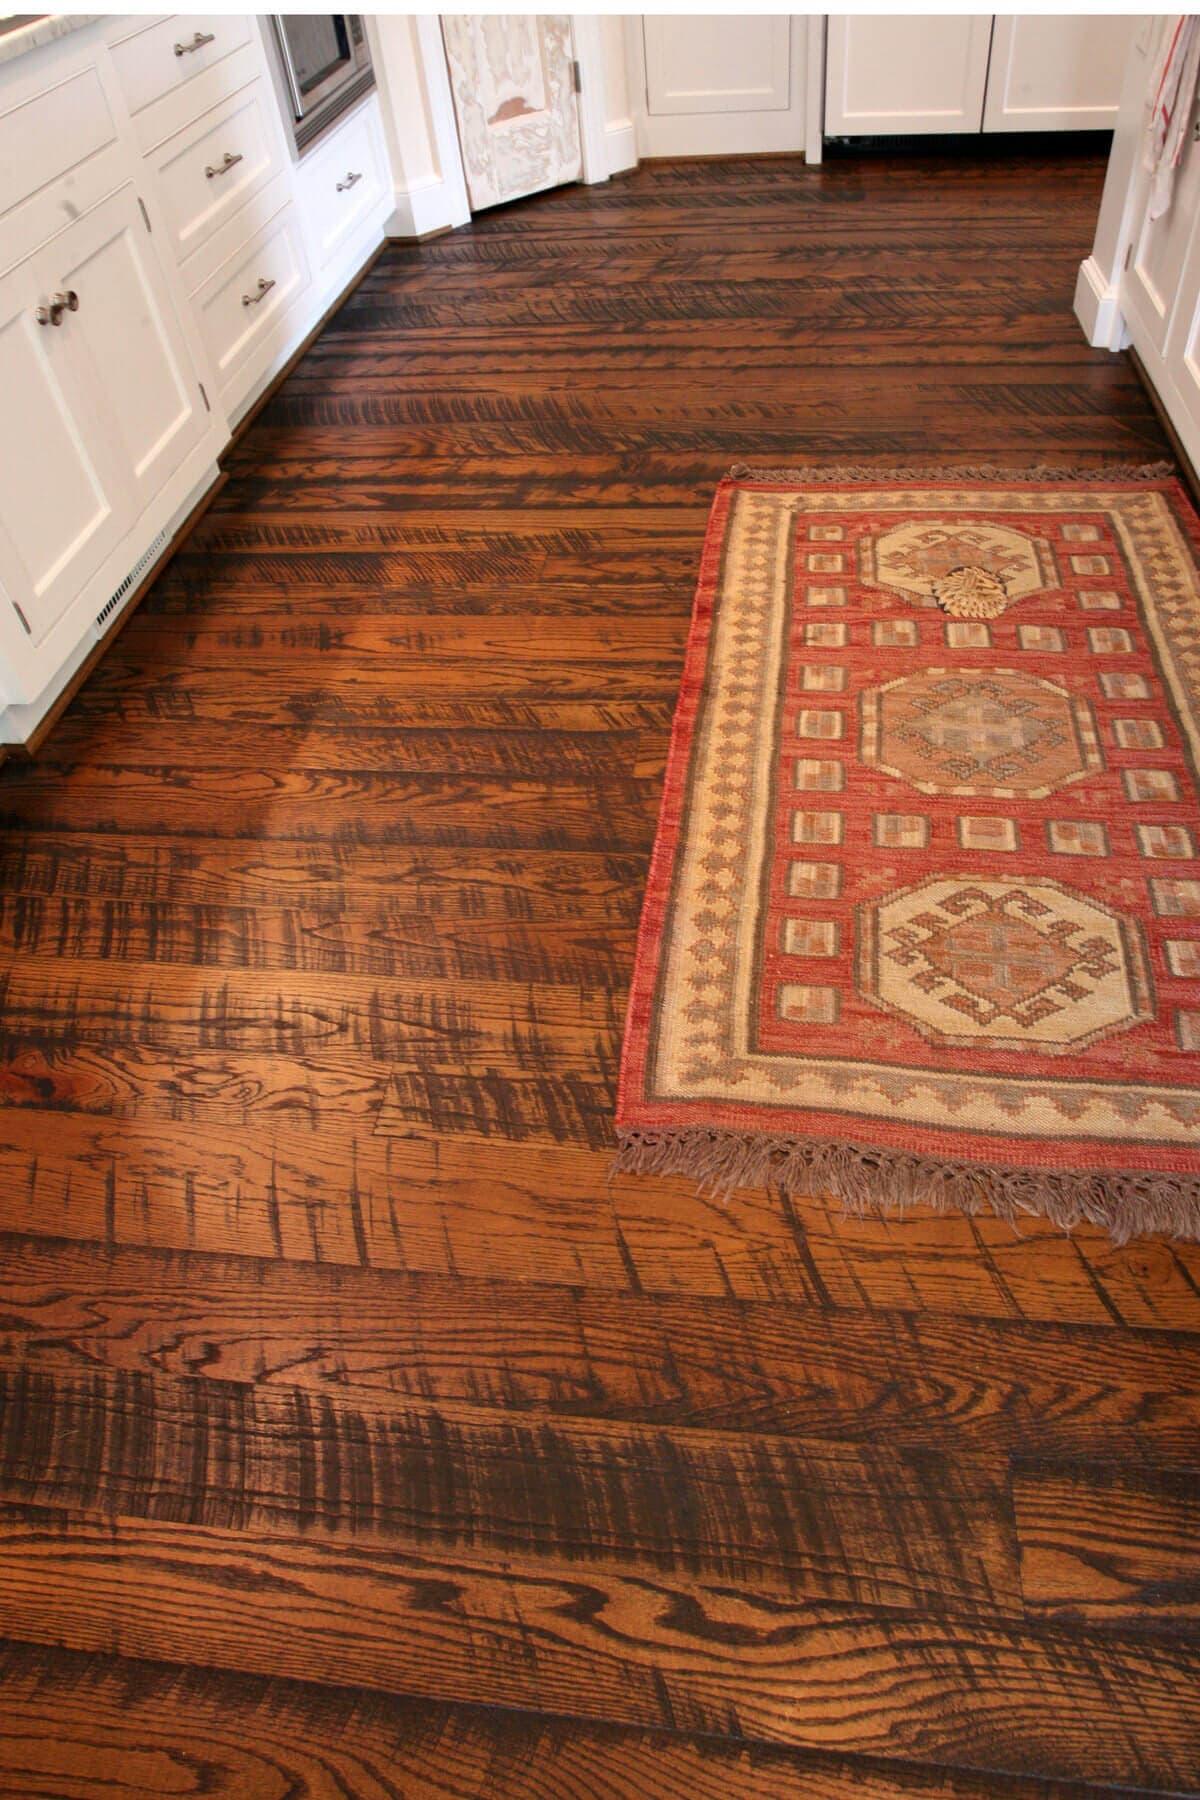 Circle sawn oak floor by Whole Log Lumber